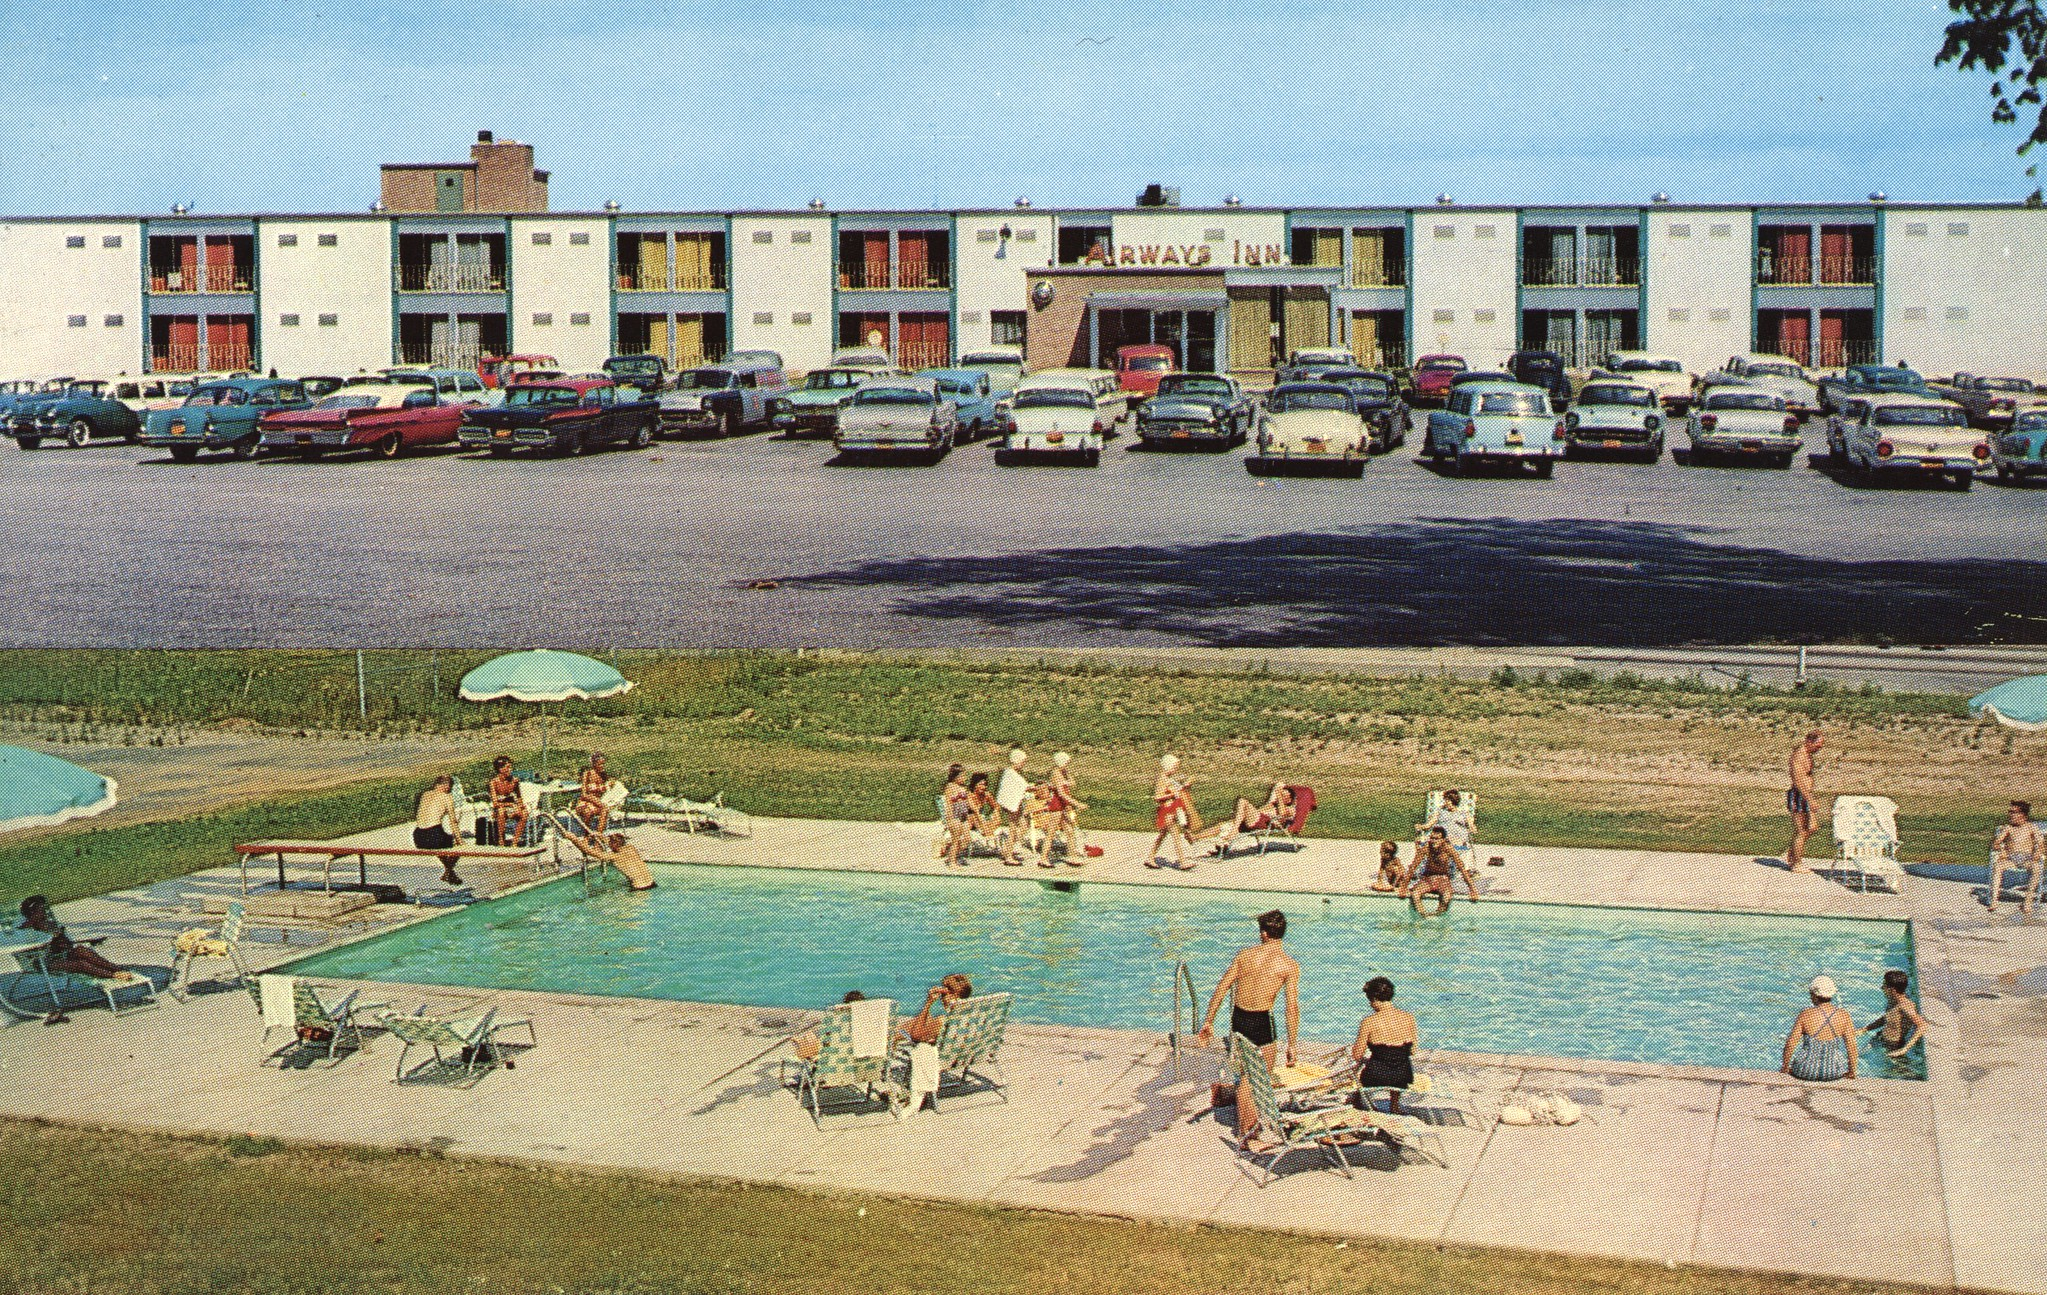 Airways Inn - Syracuse, New York